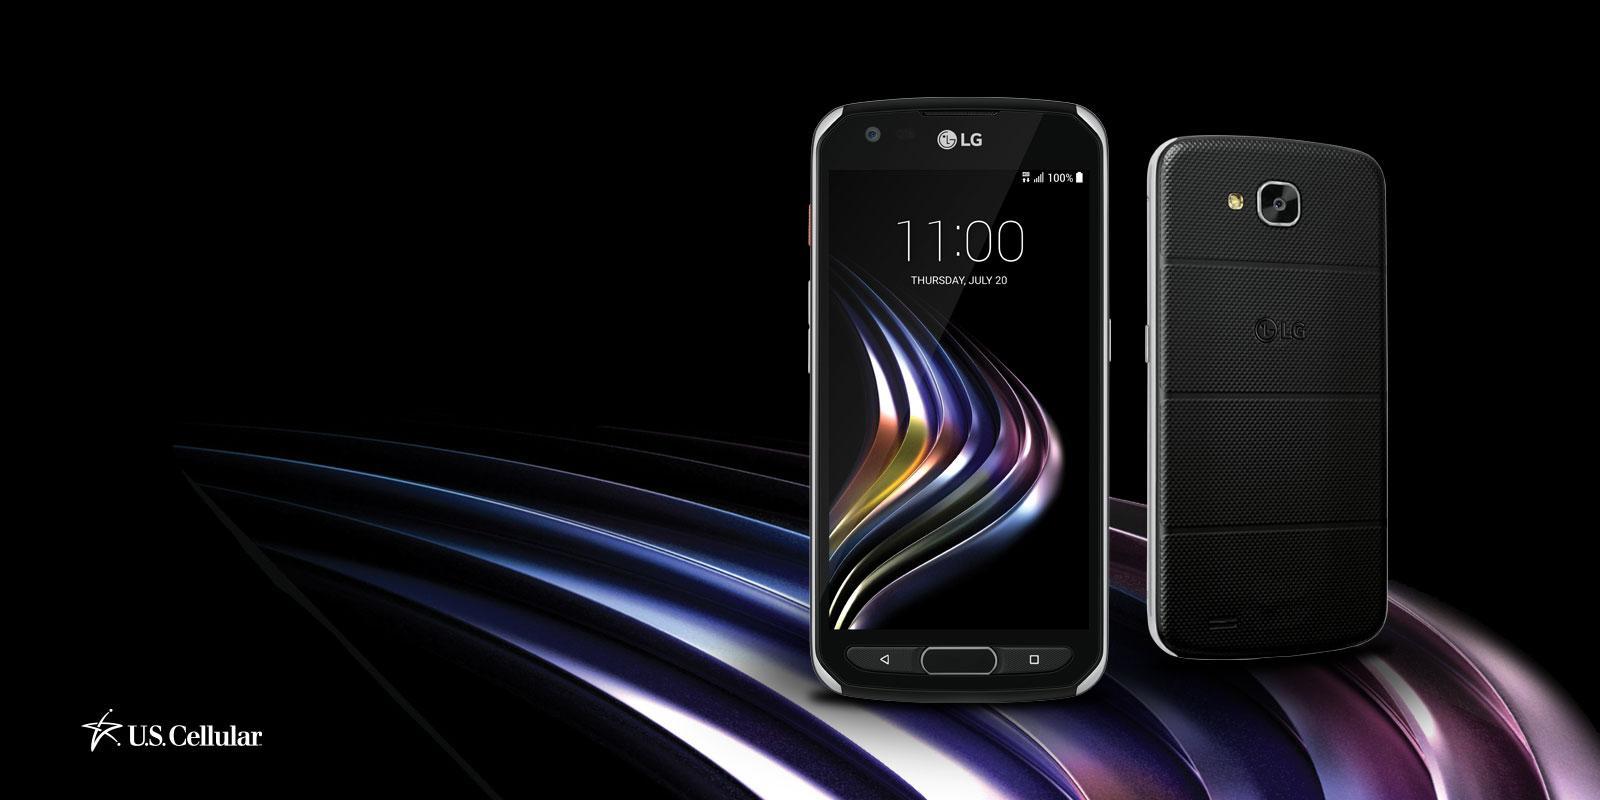 US Cellular Phones LG V Google Daydream Deal On Sale - Locate on google maps the us cellular center